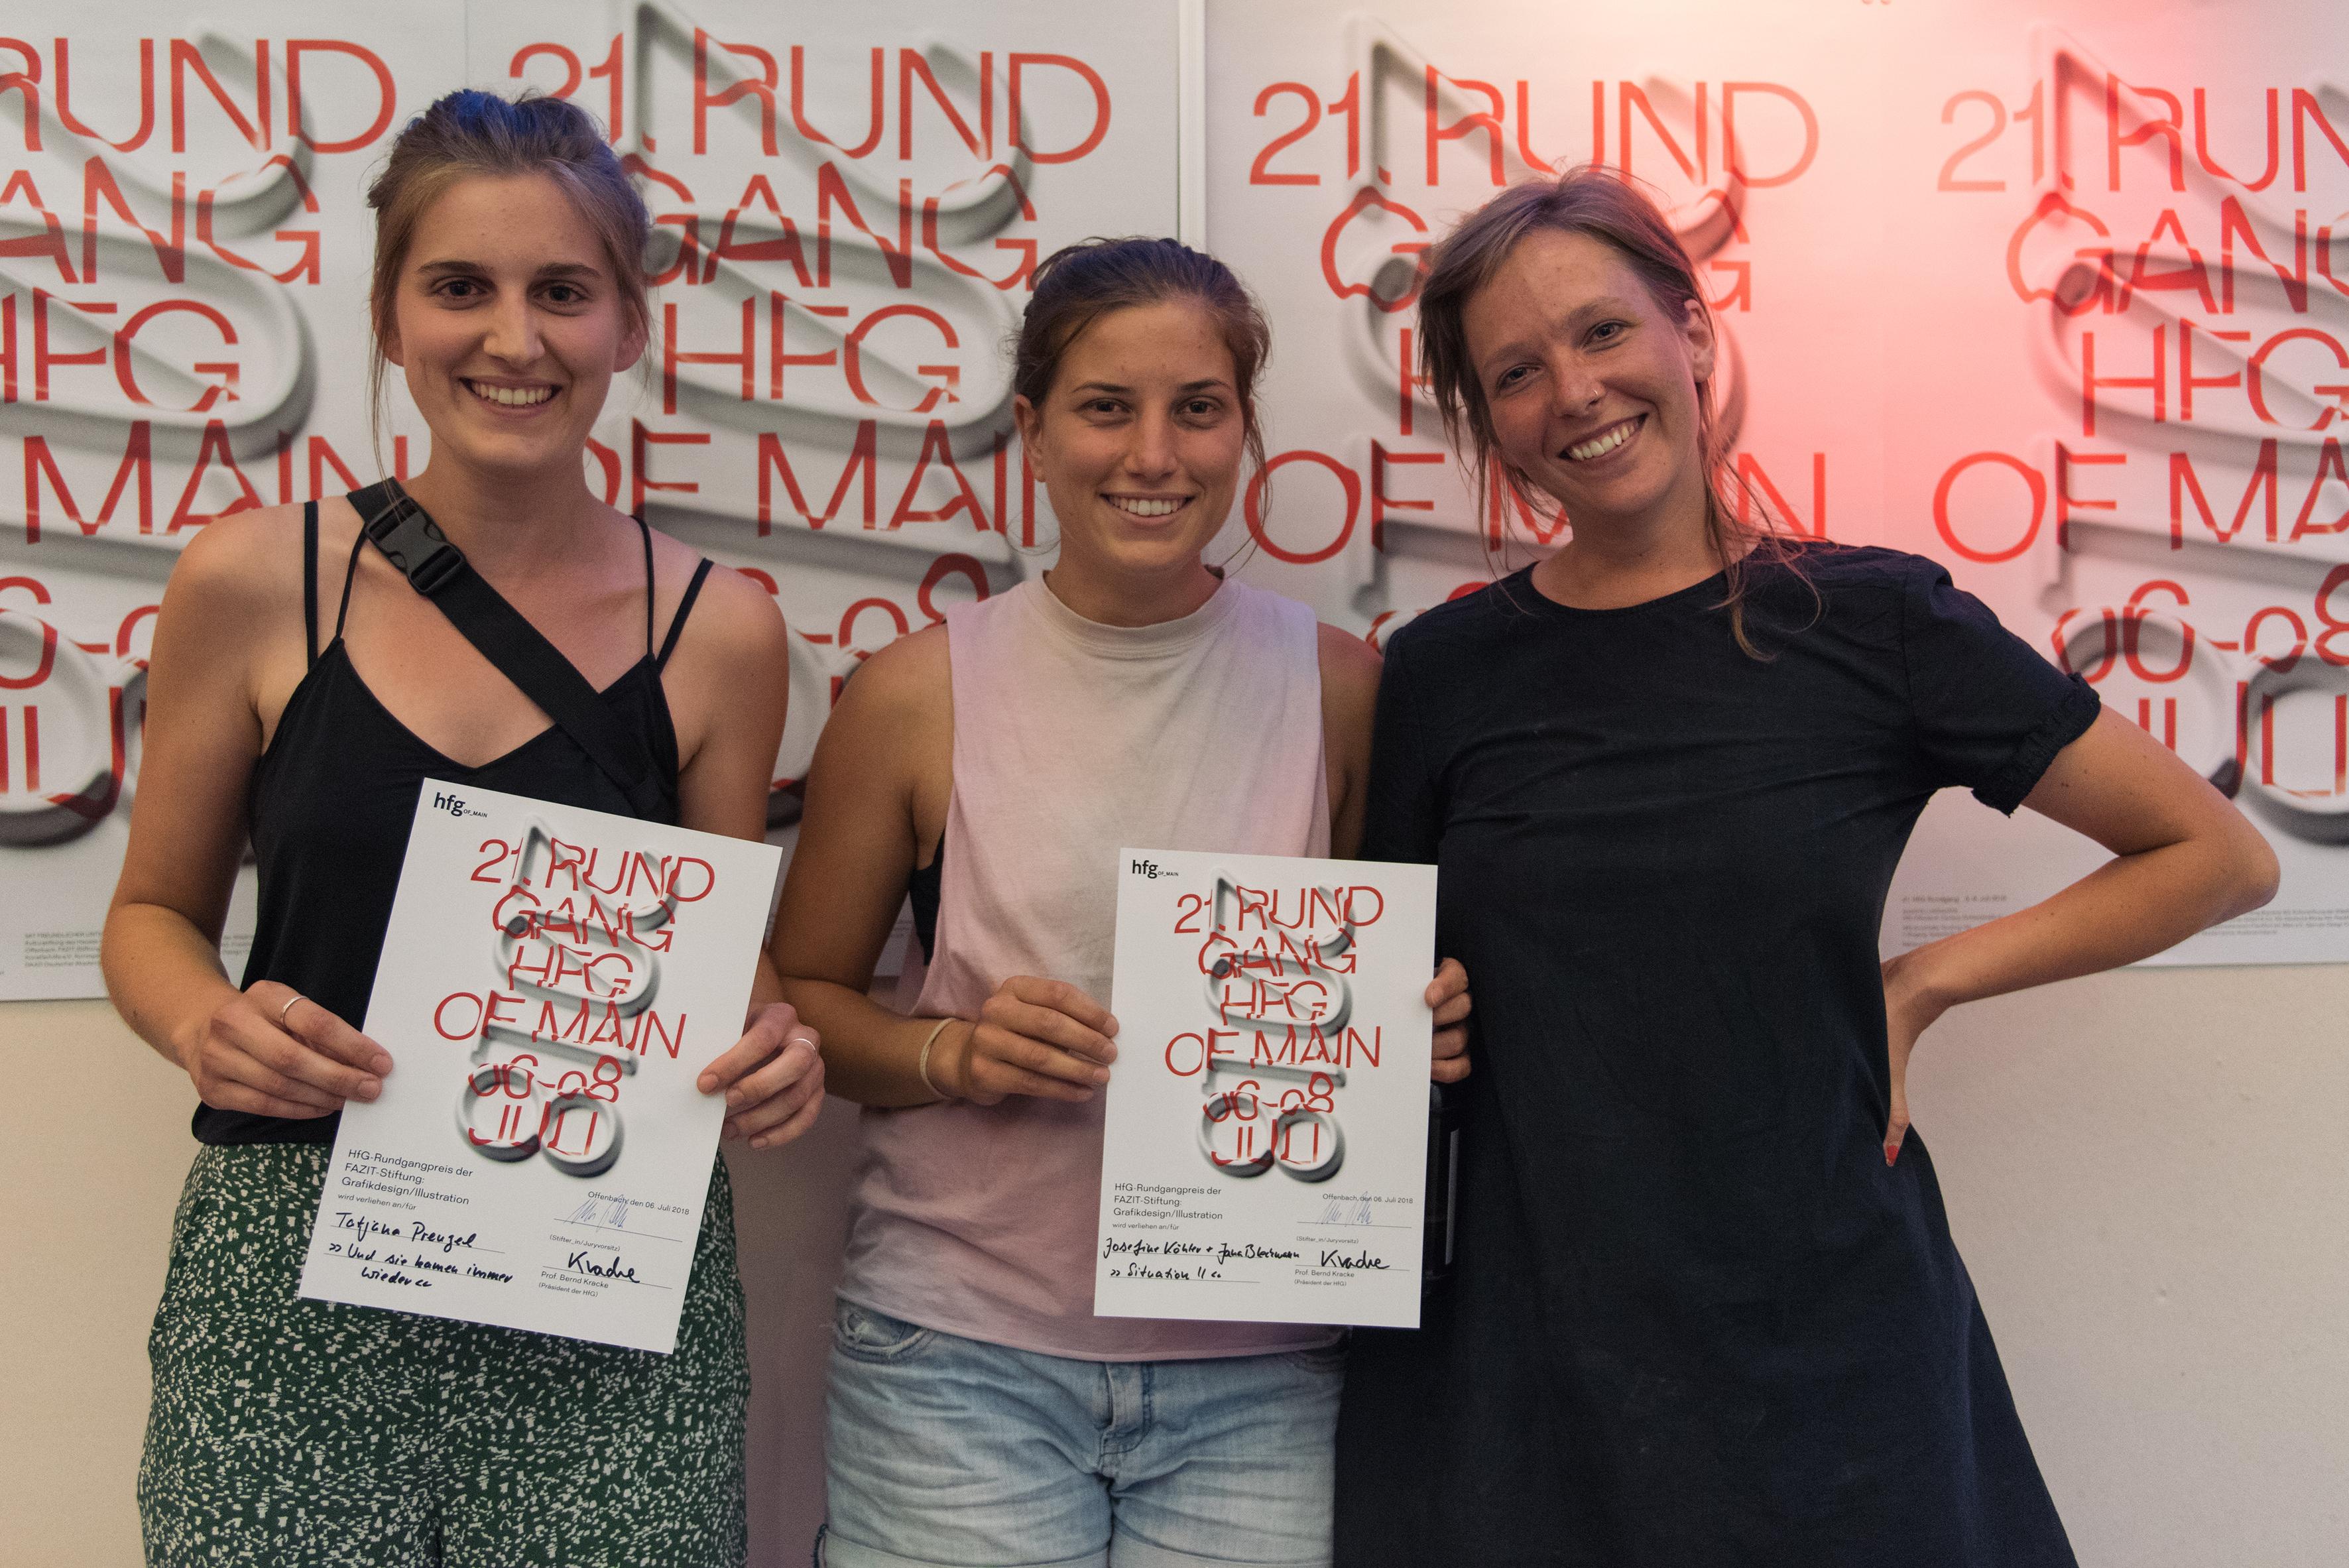 Hfg Offenbach Rundgangpreise 2018